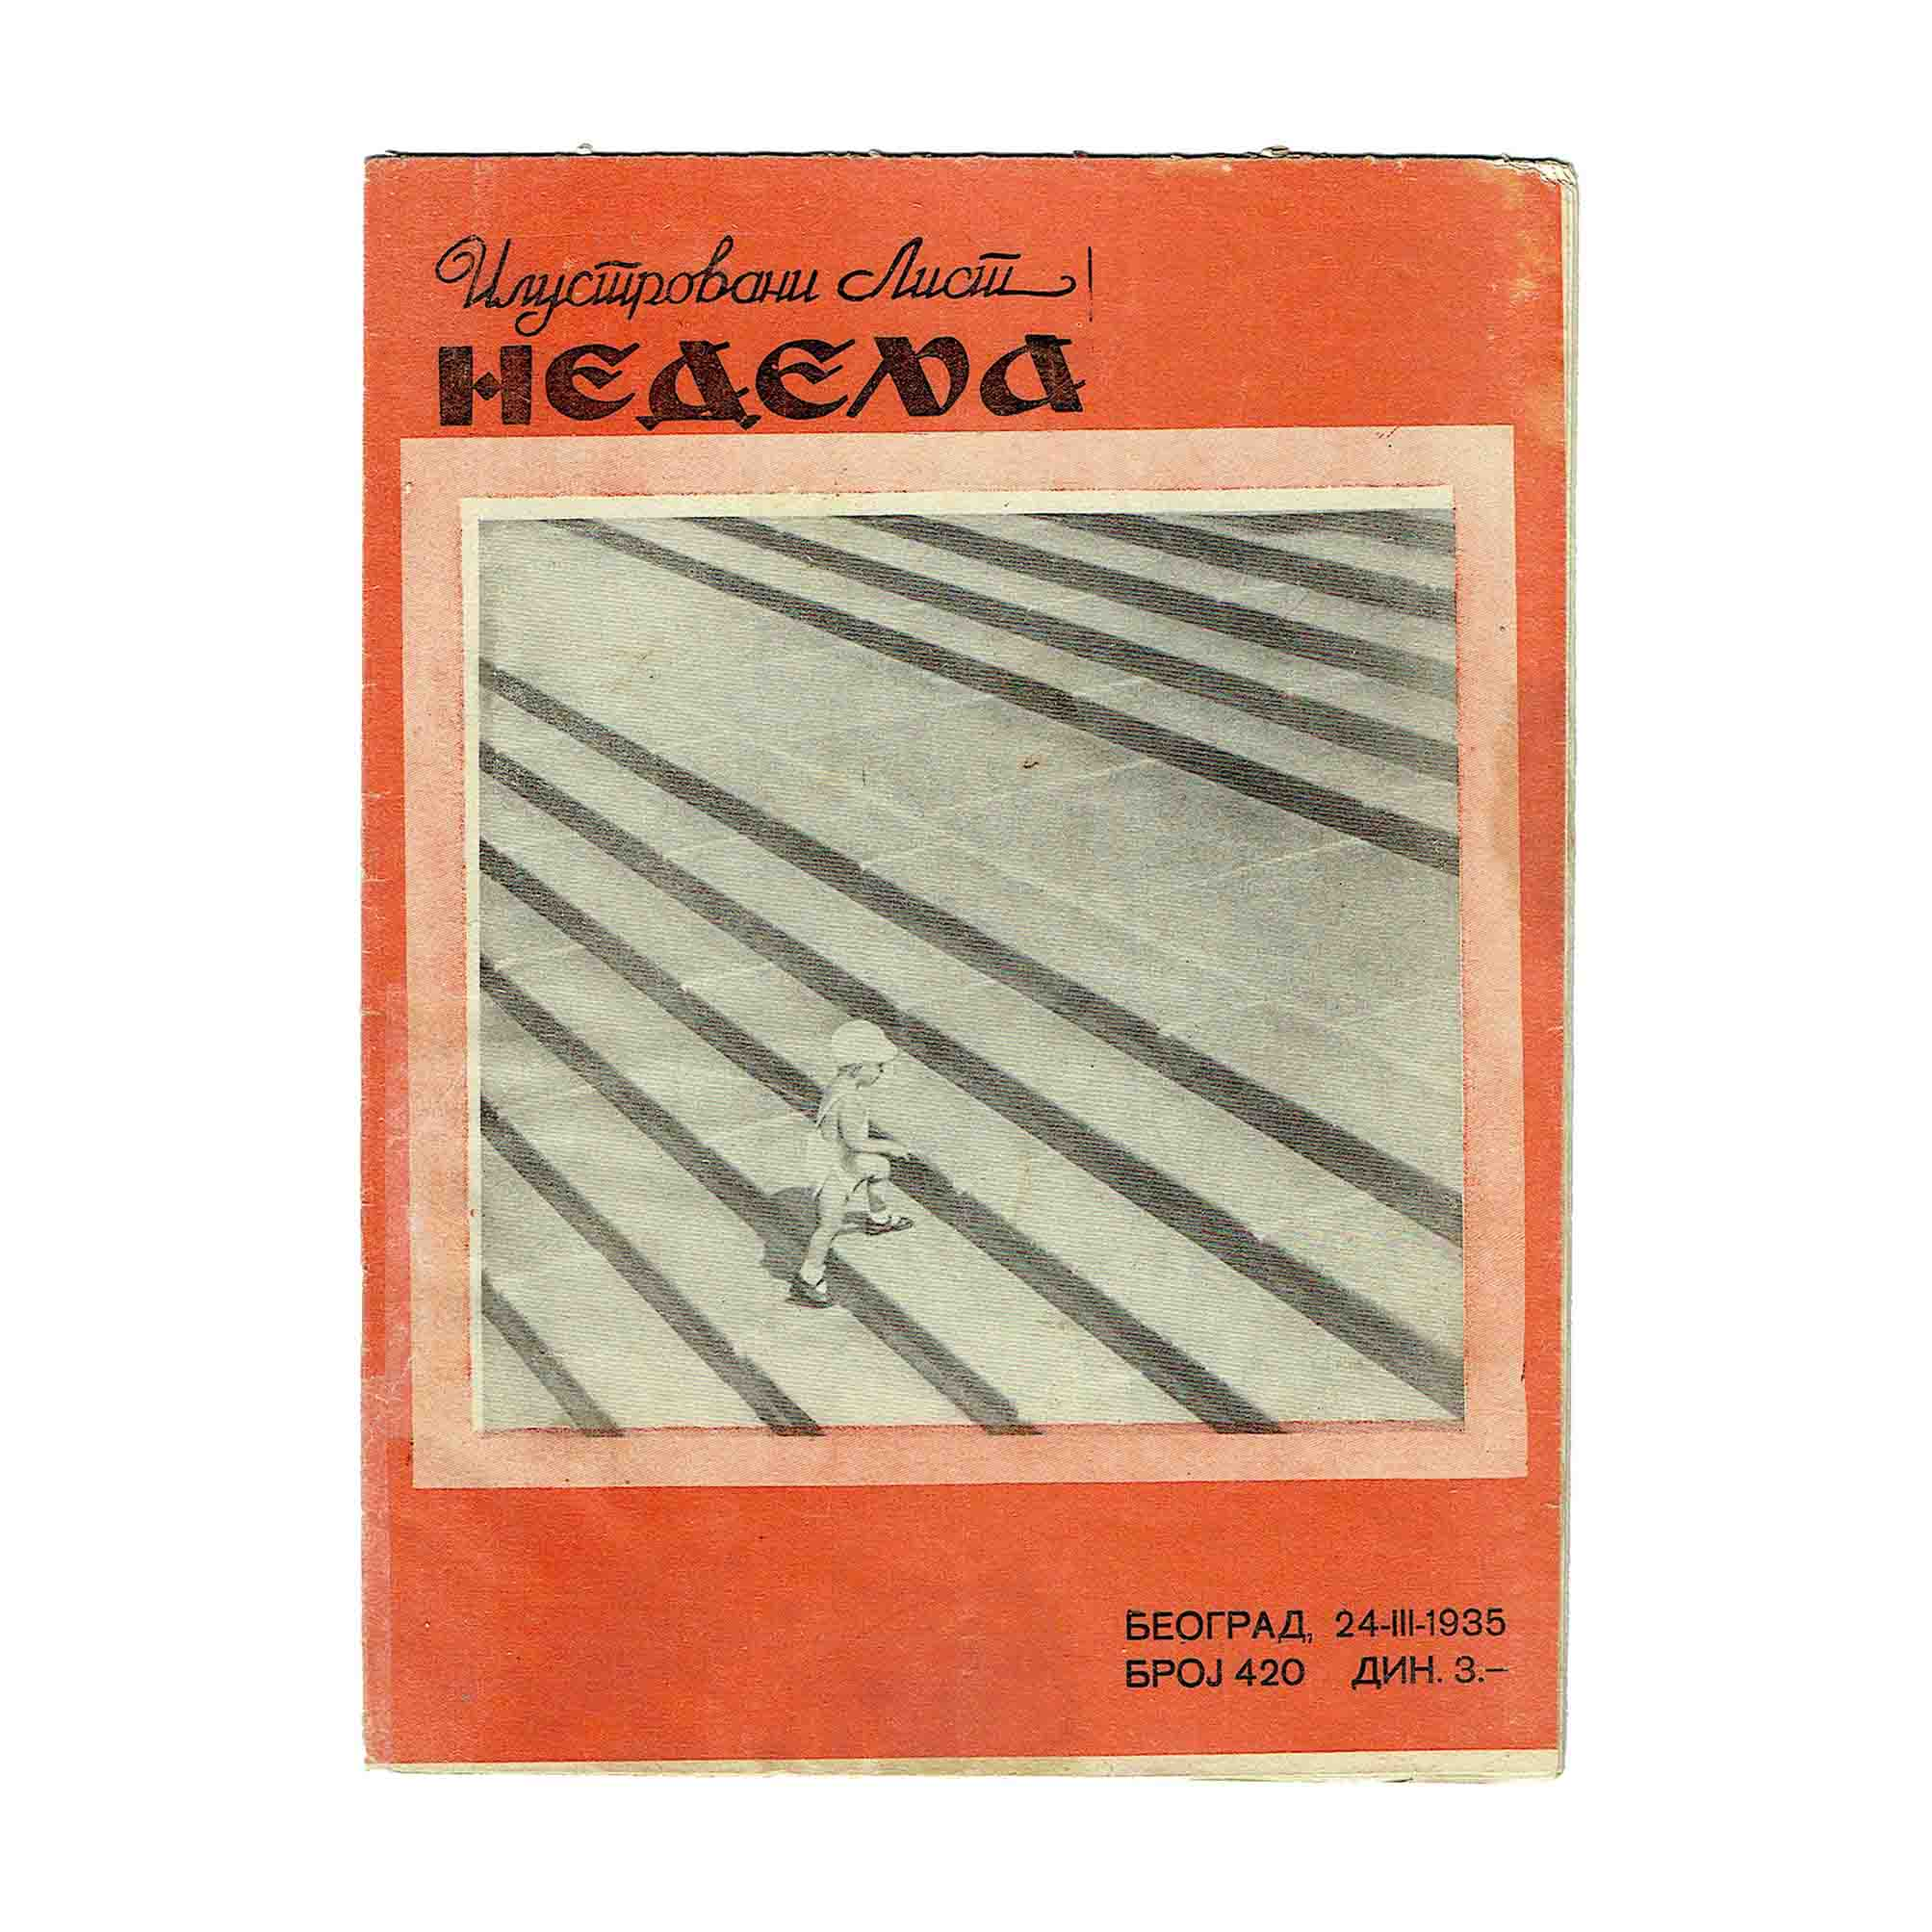 5926 Ilustrovani list Nedelja 420 1935 Titel Fotomontage frei A N